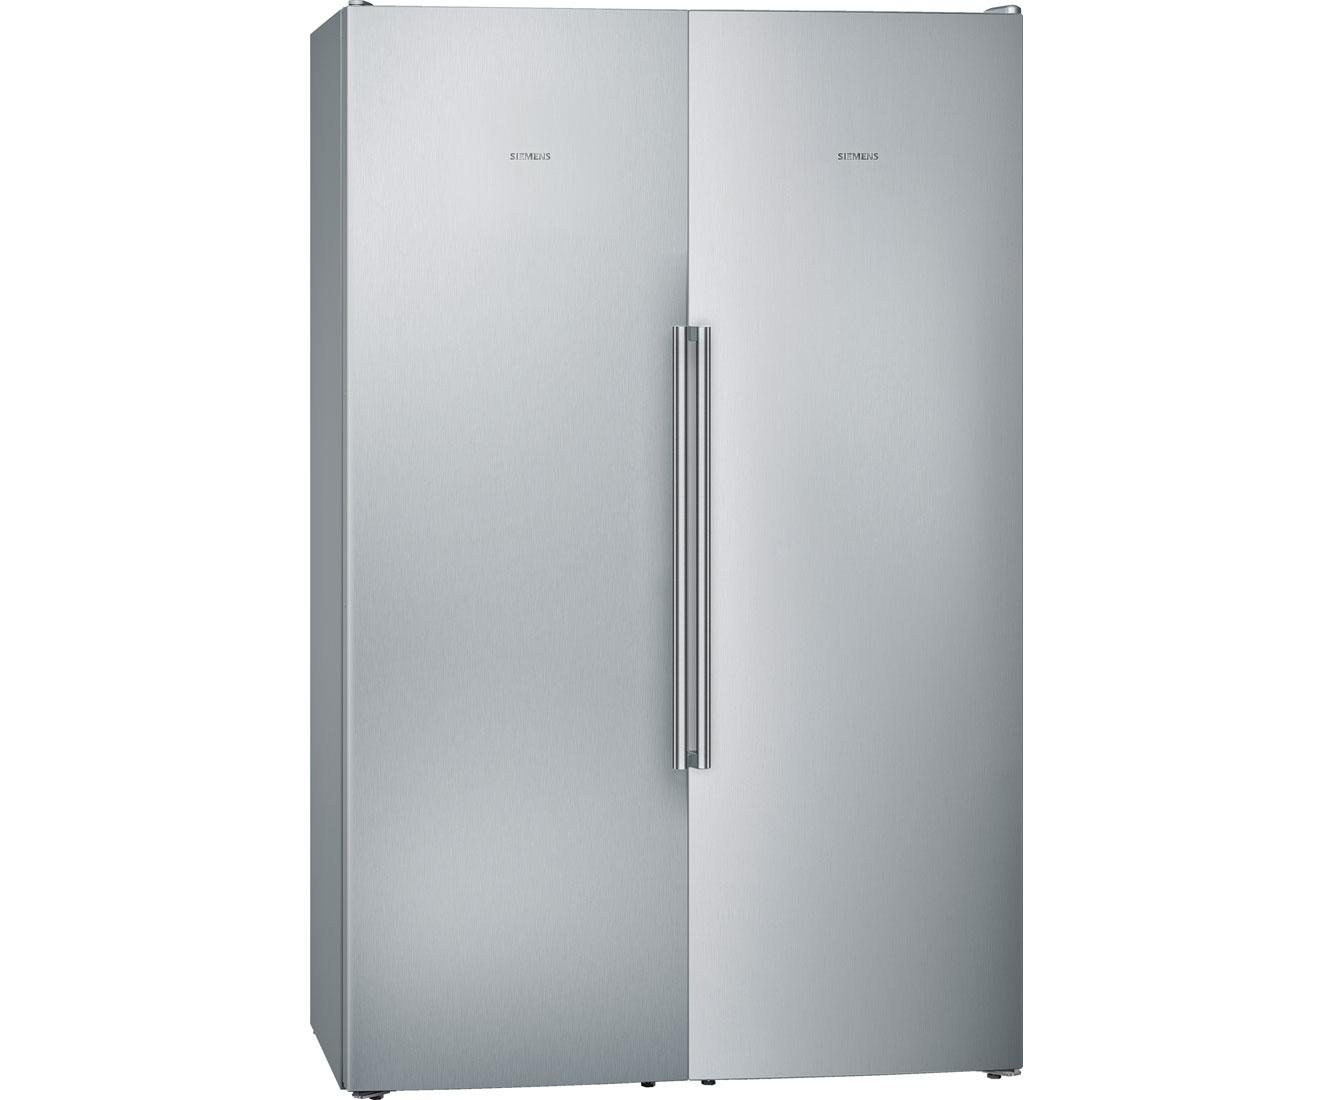 Gorenje Kühlschrank Geräusche : Gorenje kühlschrank komische geräusche gorenje kühlschrank macht